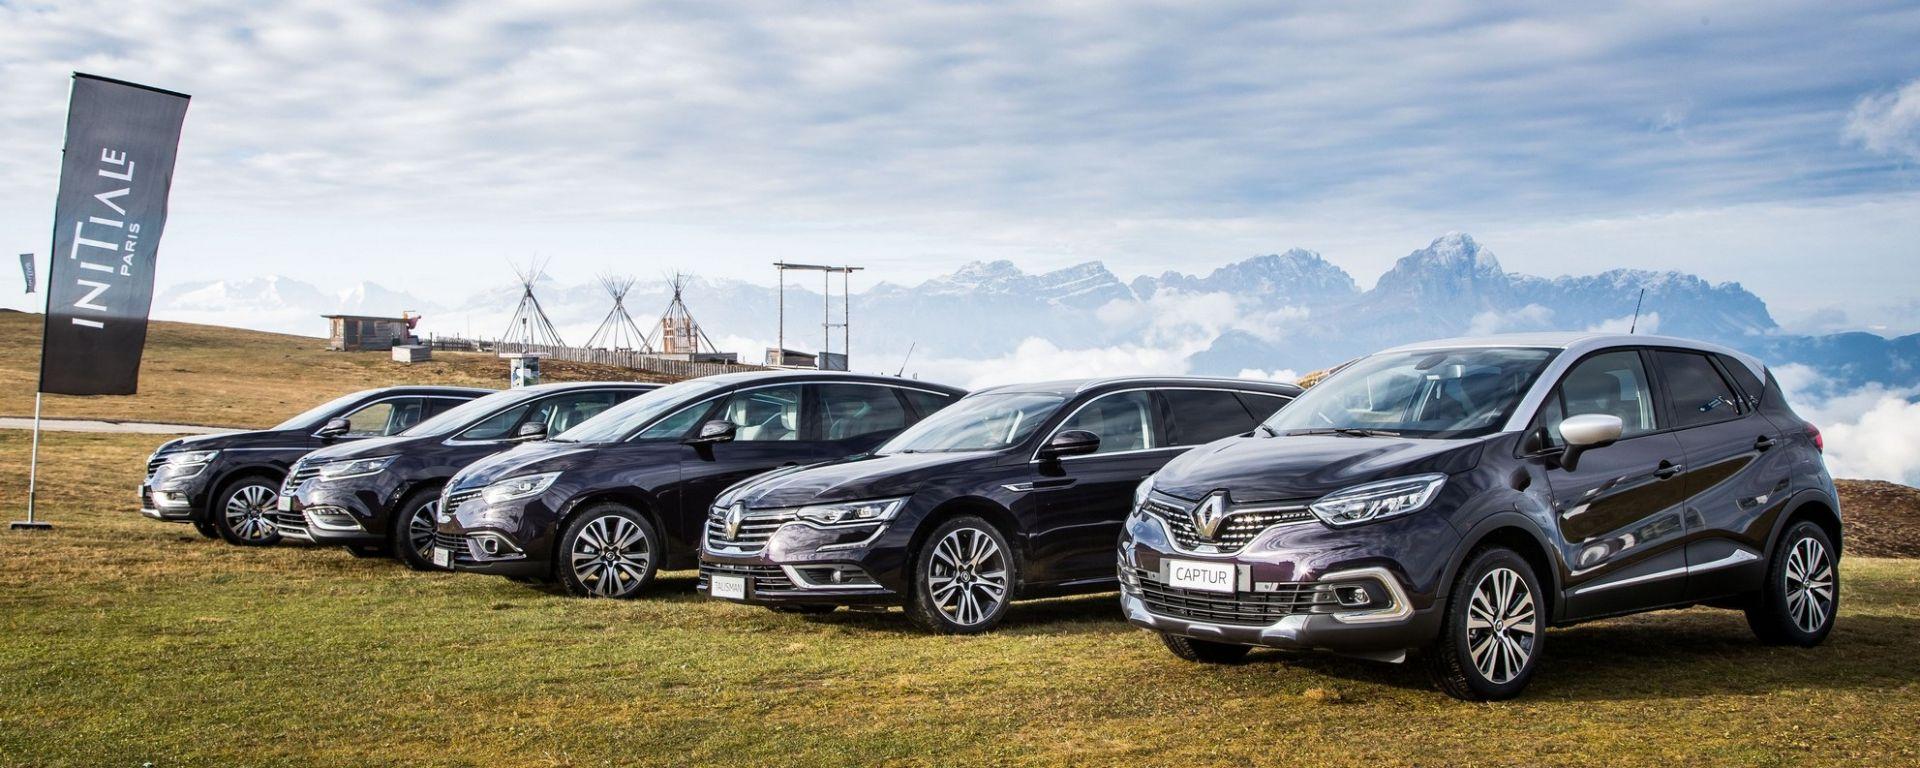 Renault Initiale Paris, il top della gamma francese